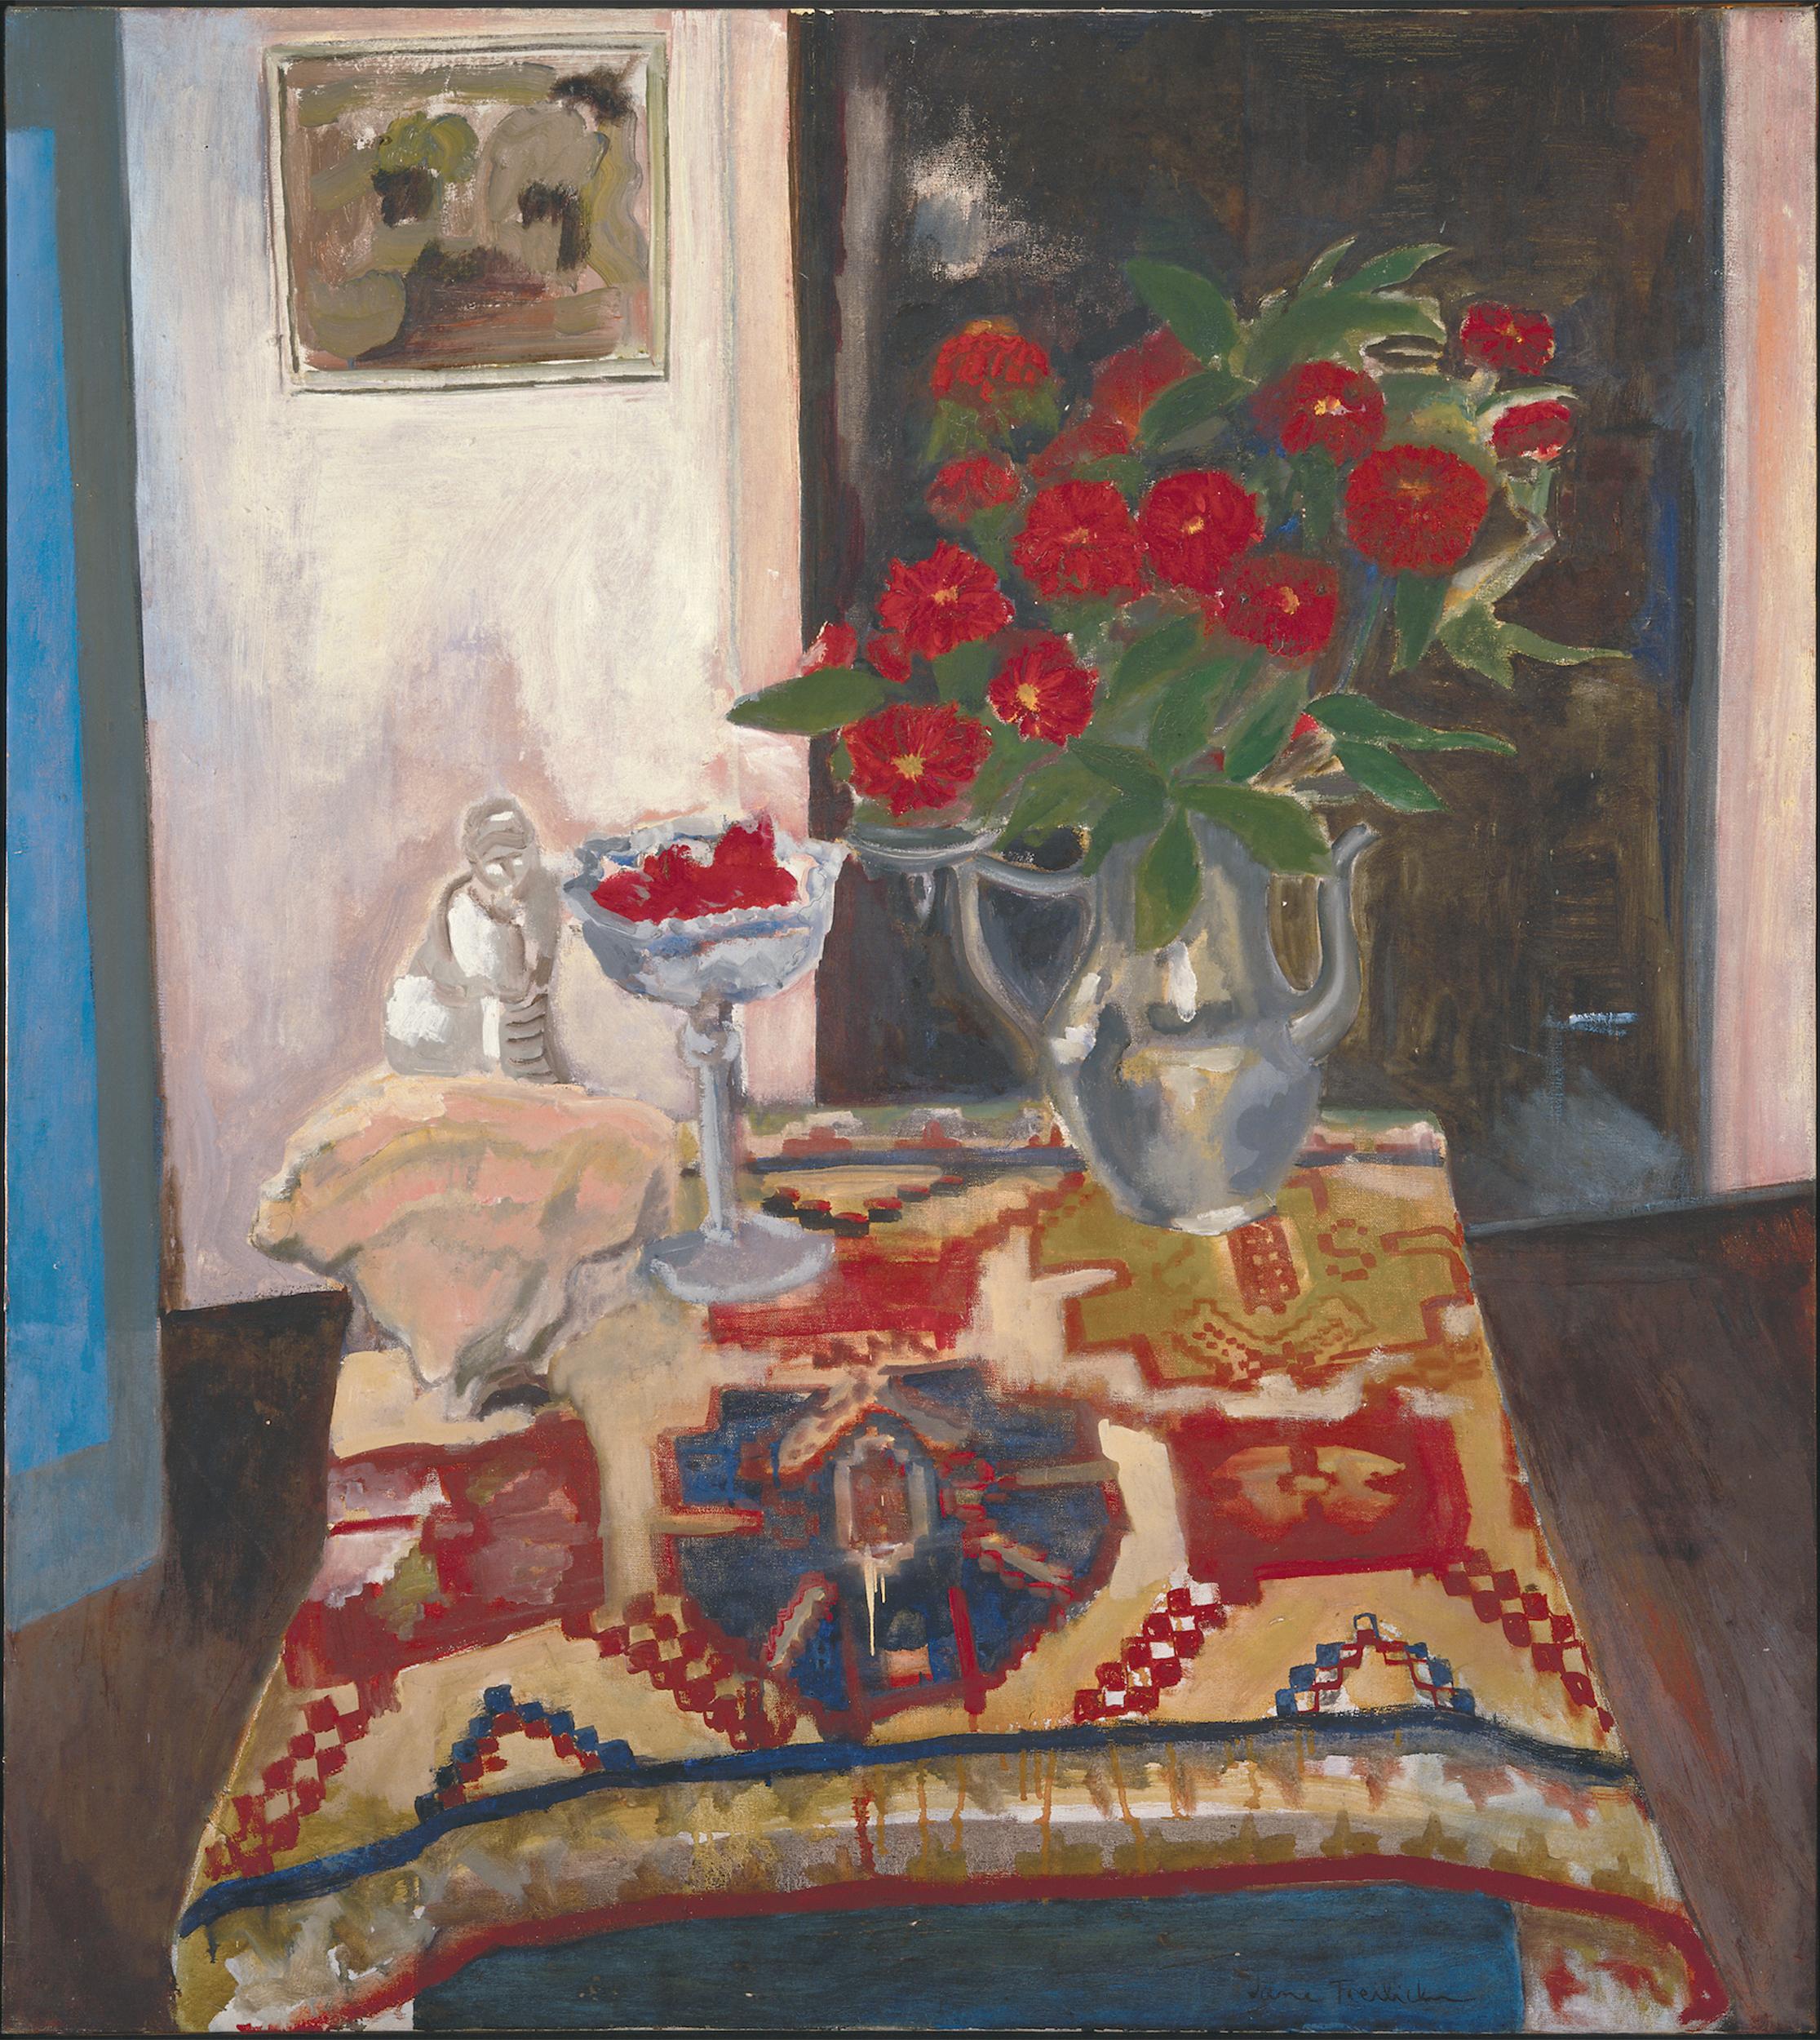 Jane Freilicher, Still Life (Persian carpet), 1955, oil on linen, 40 x 36 inches, 101.6 x 91.4 cm. Courtesy the estate of Jane Freilicher and Paul Kasmin Gallery.